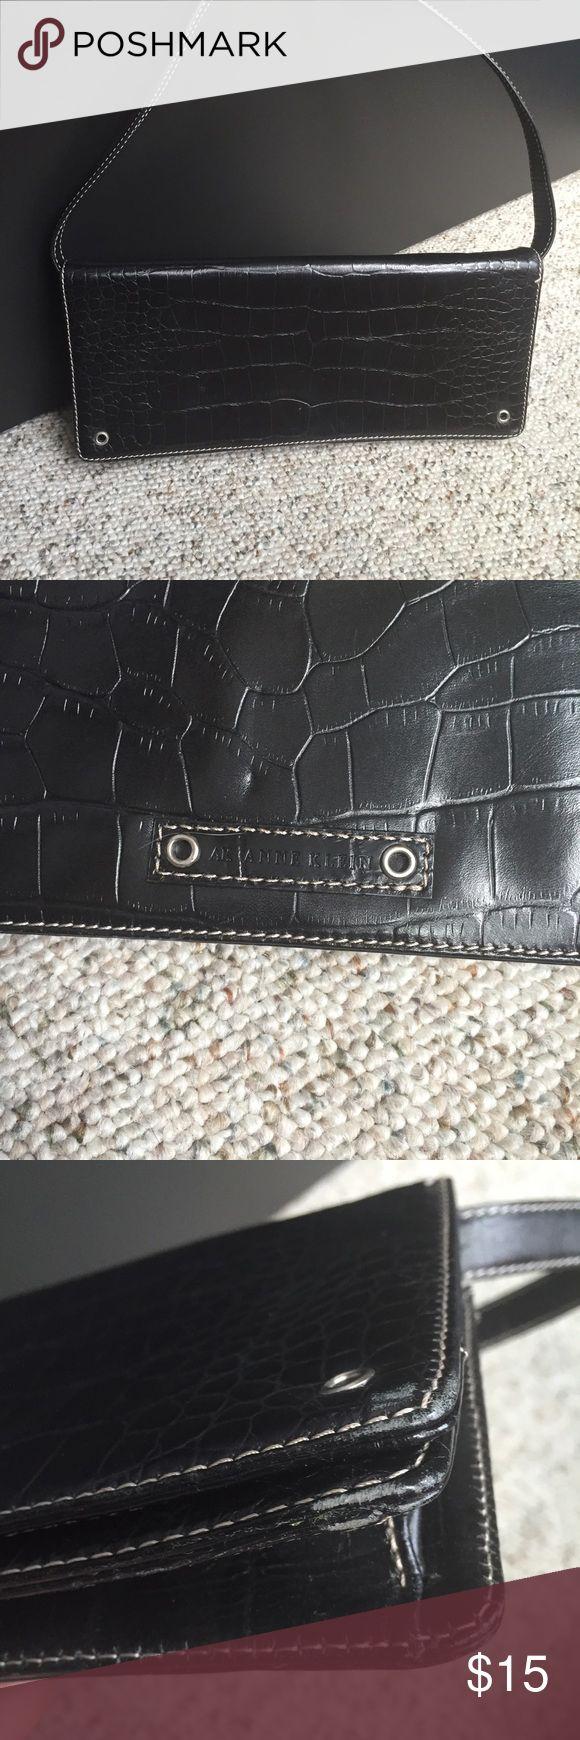 Anne Klein Bags - Anne Klein black rectangular purse